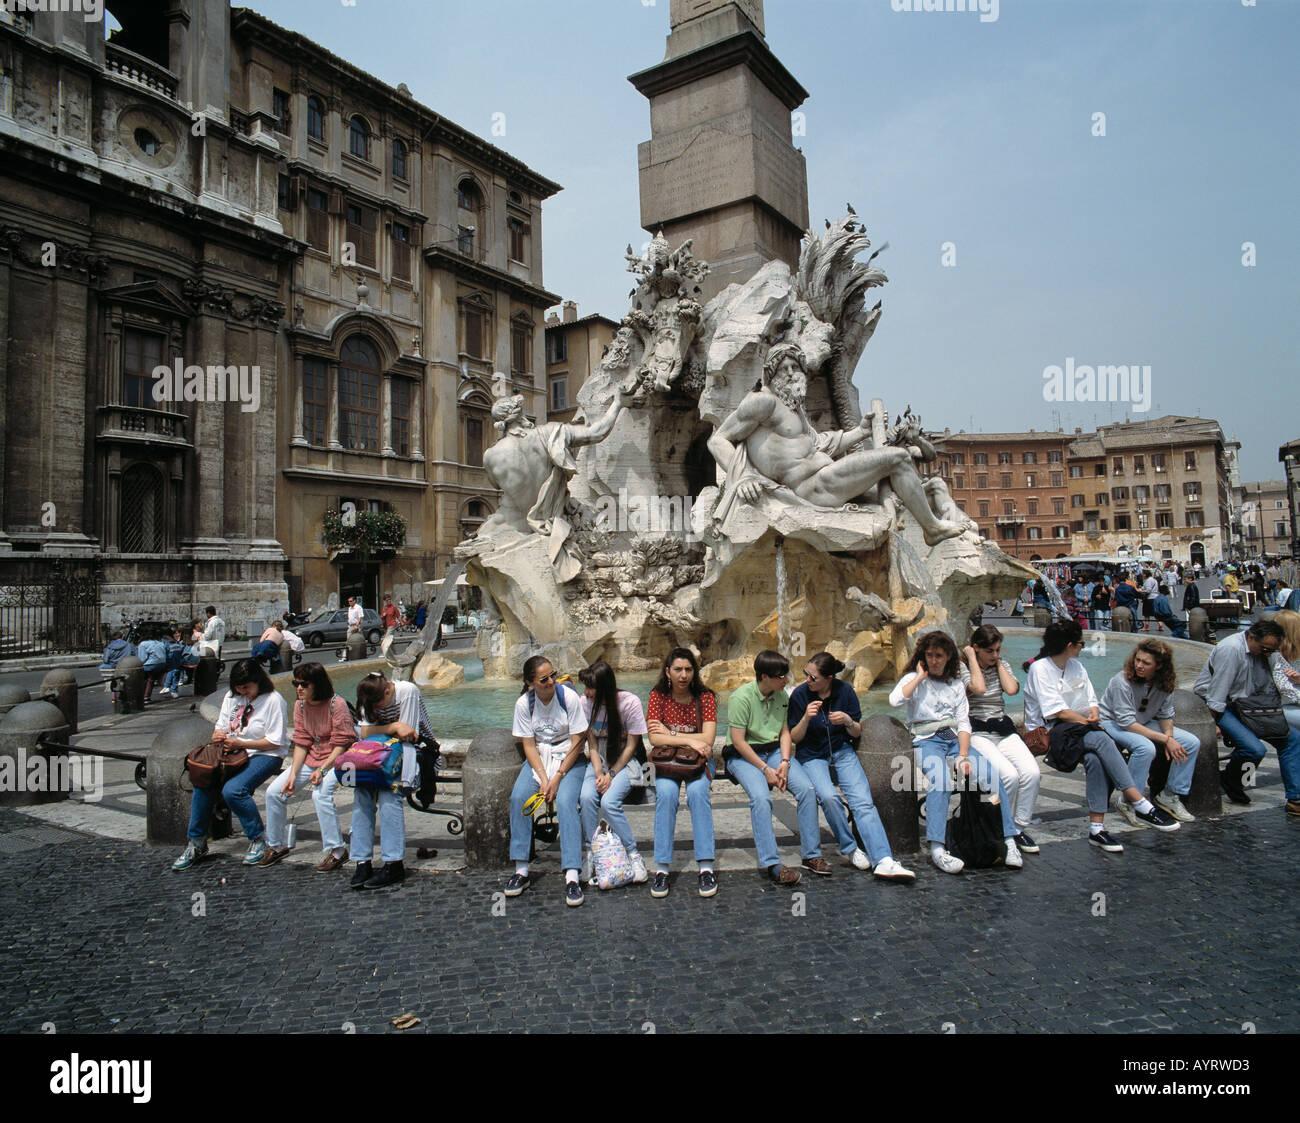 Italy, I-Rome, Piazza Navona, Fontana dei Fiumi, Bernini, well figure, tourists, UNESCO World Heritage Site - Stock Image